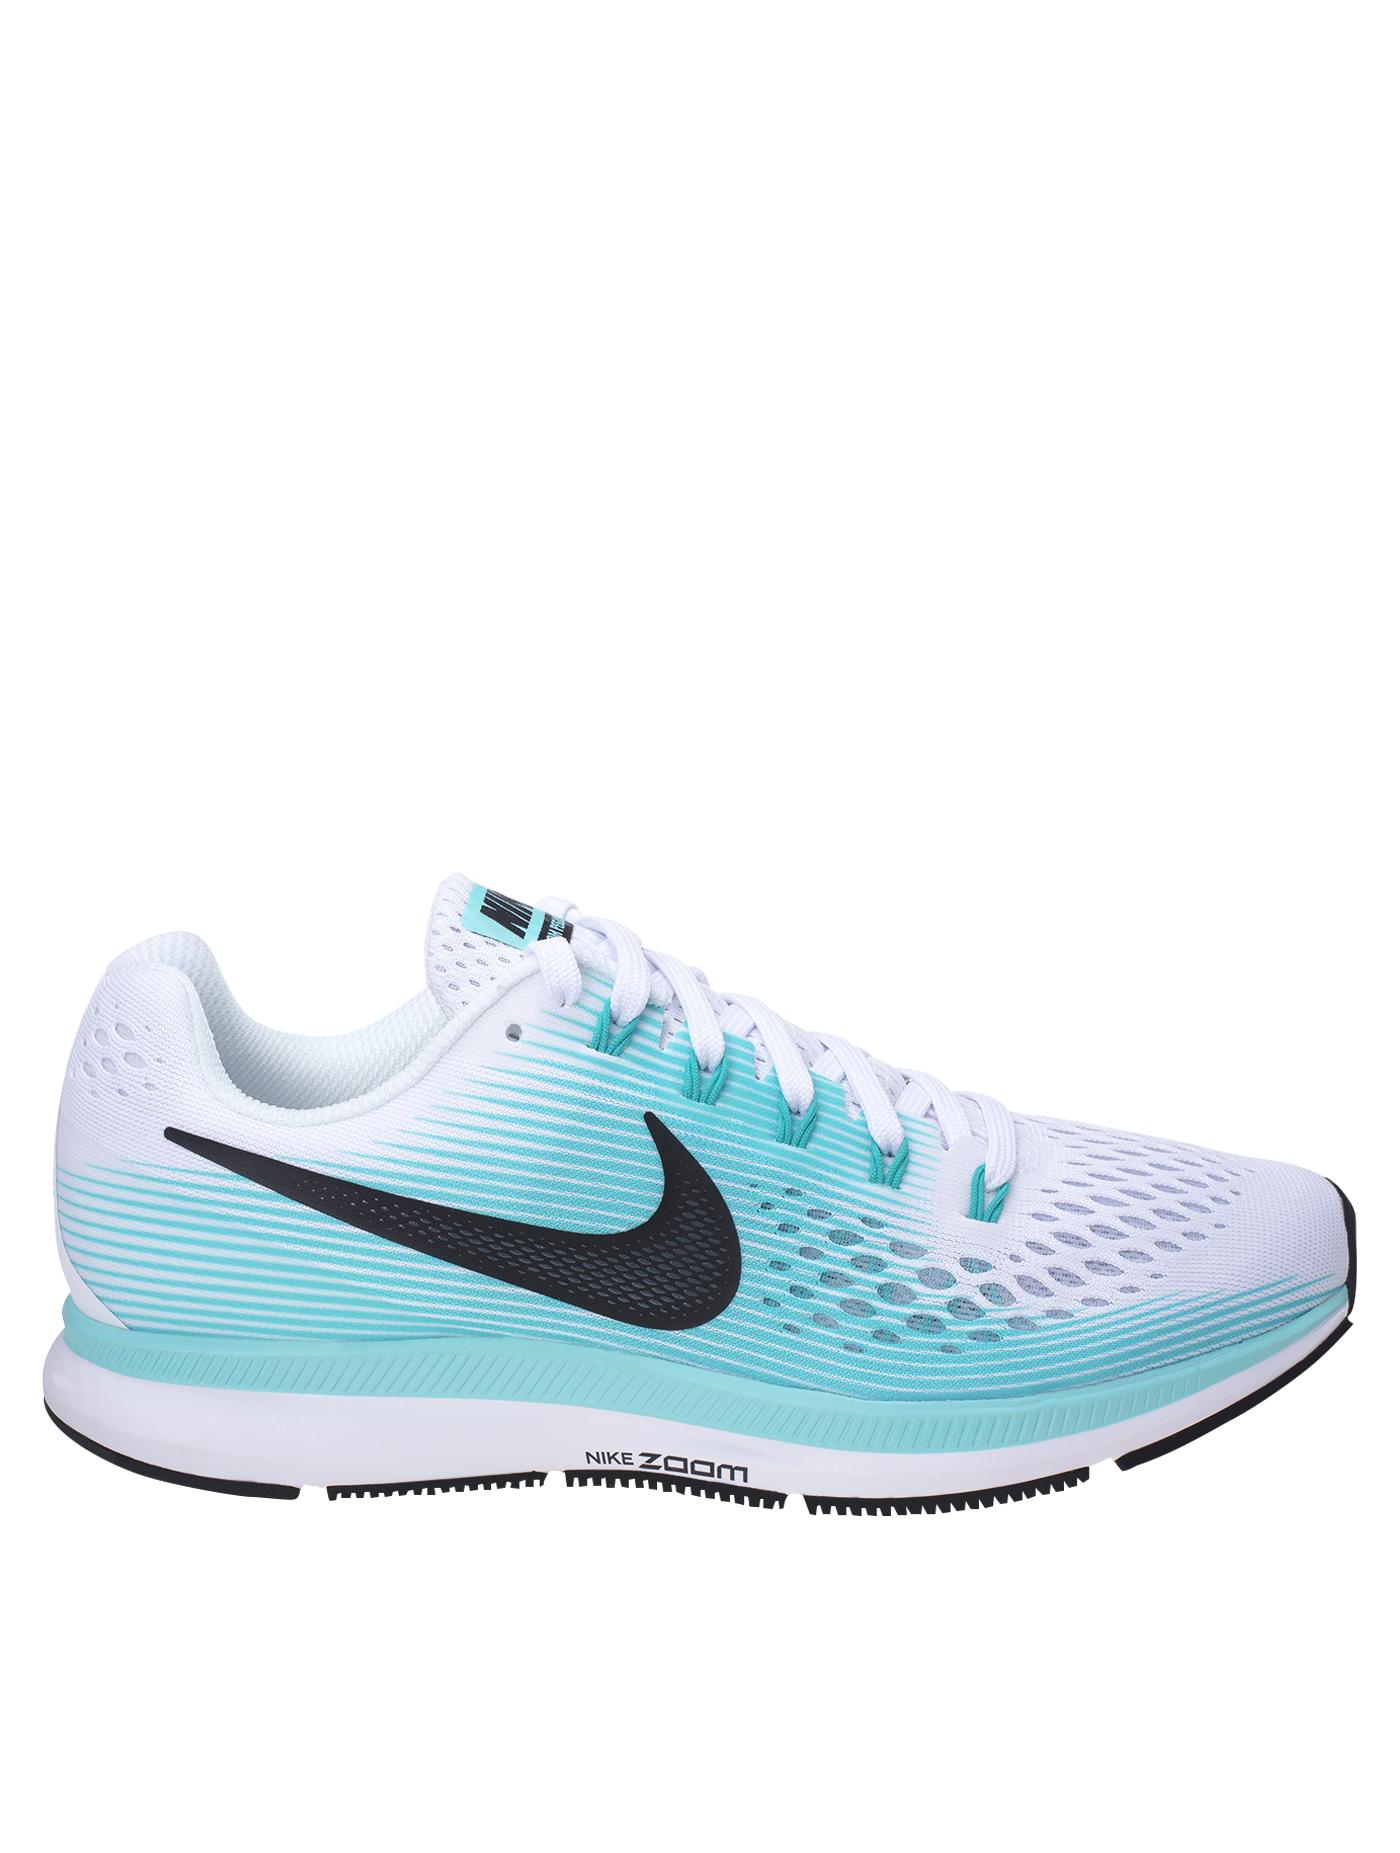 NIKE Women's Running Shoes Air Zoom Pegasus 34 880560